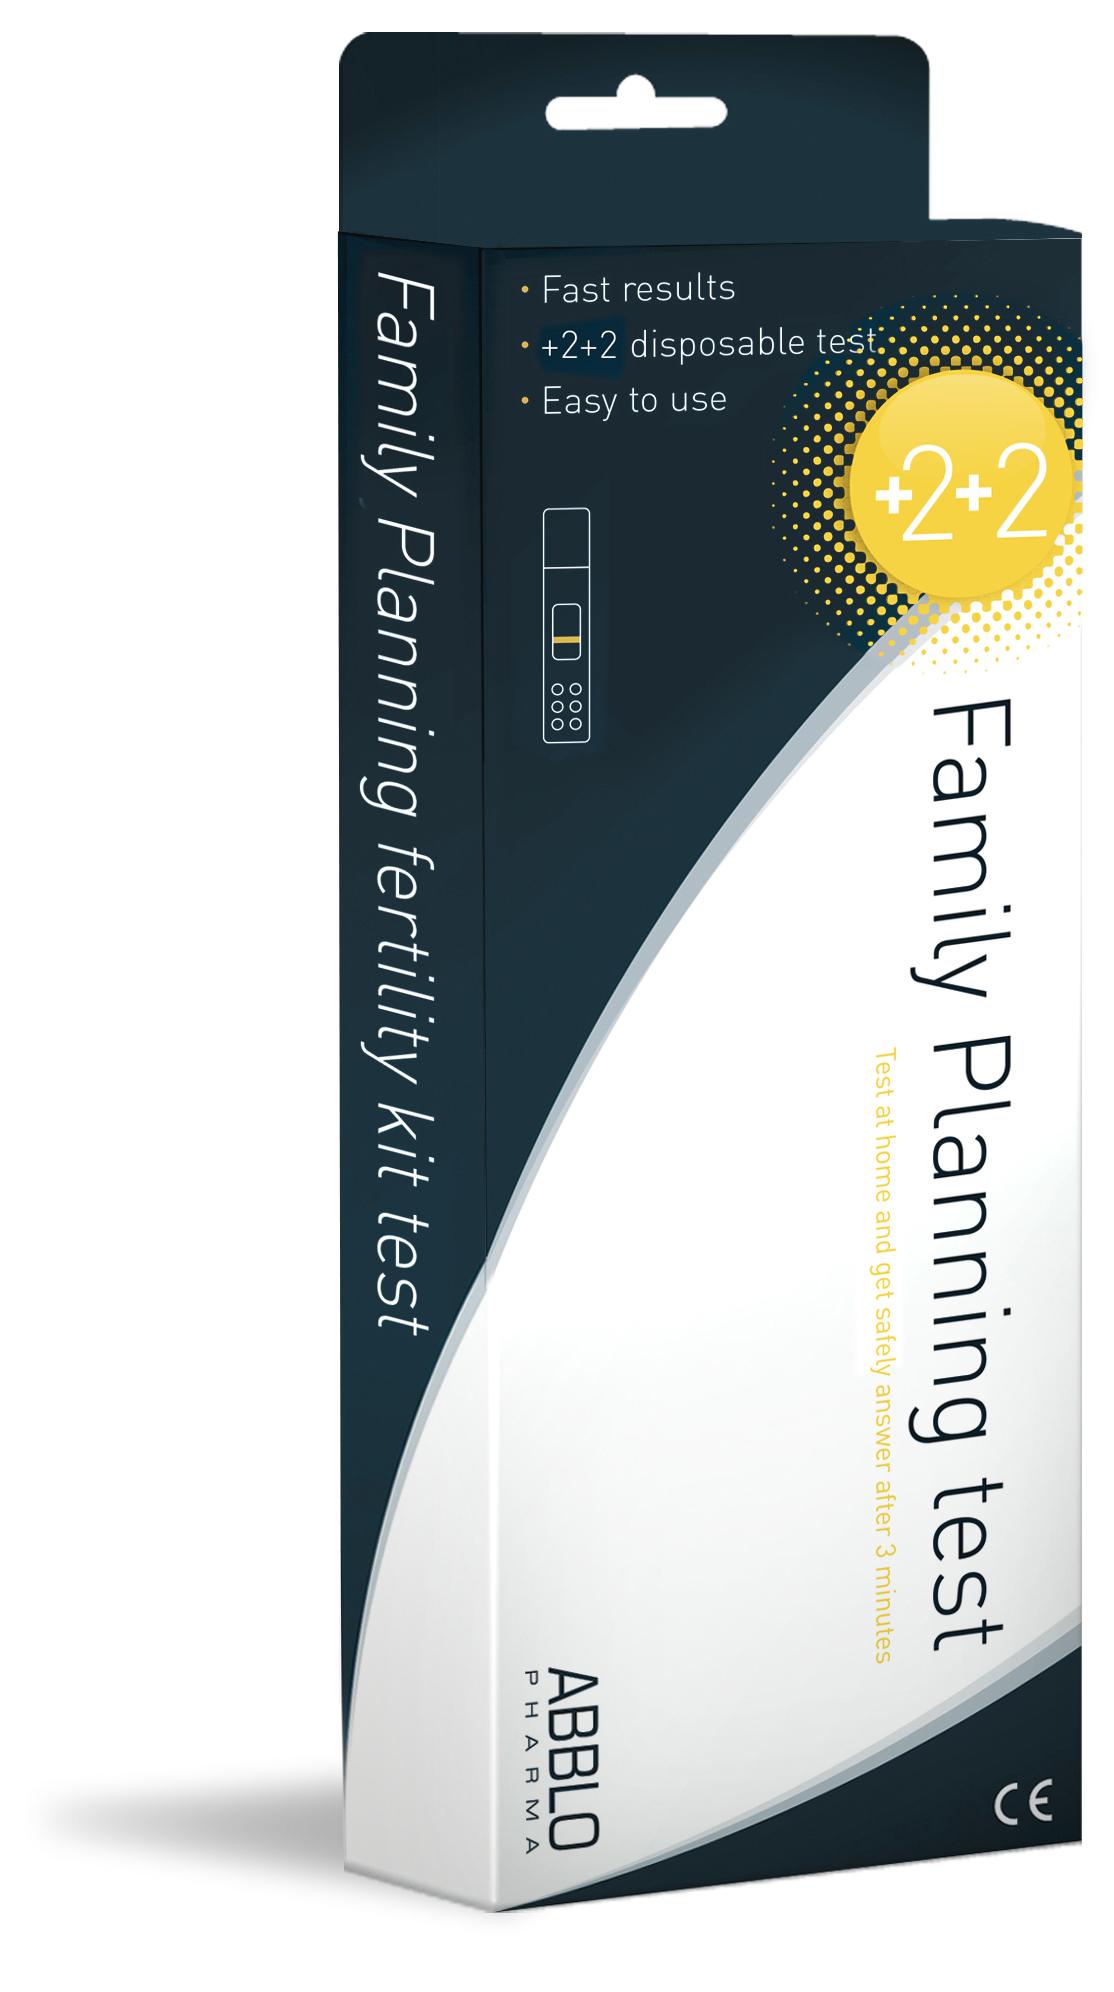 ABBLO_Pharma_Family_Planning